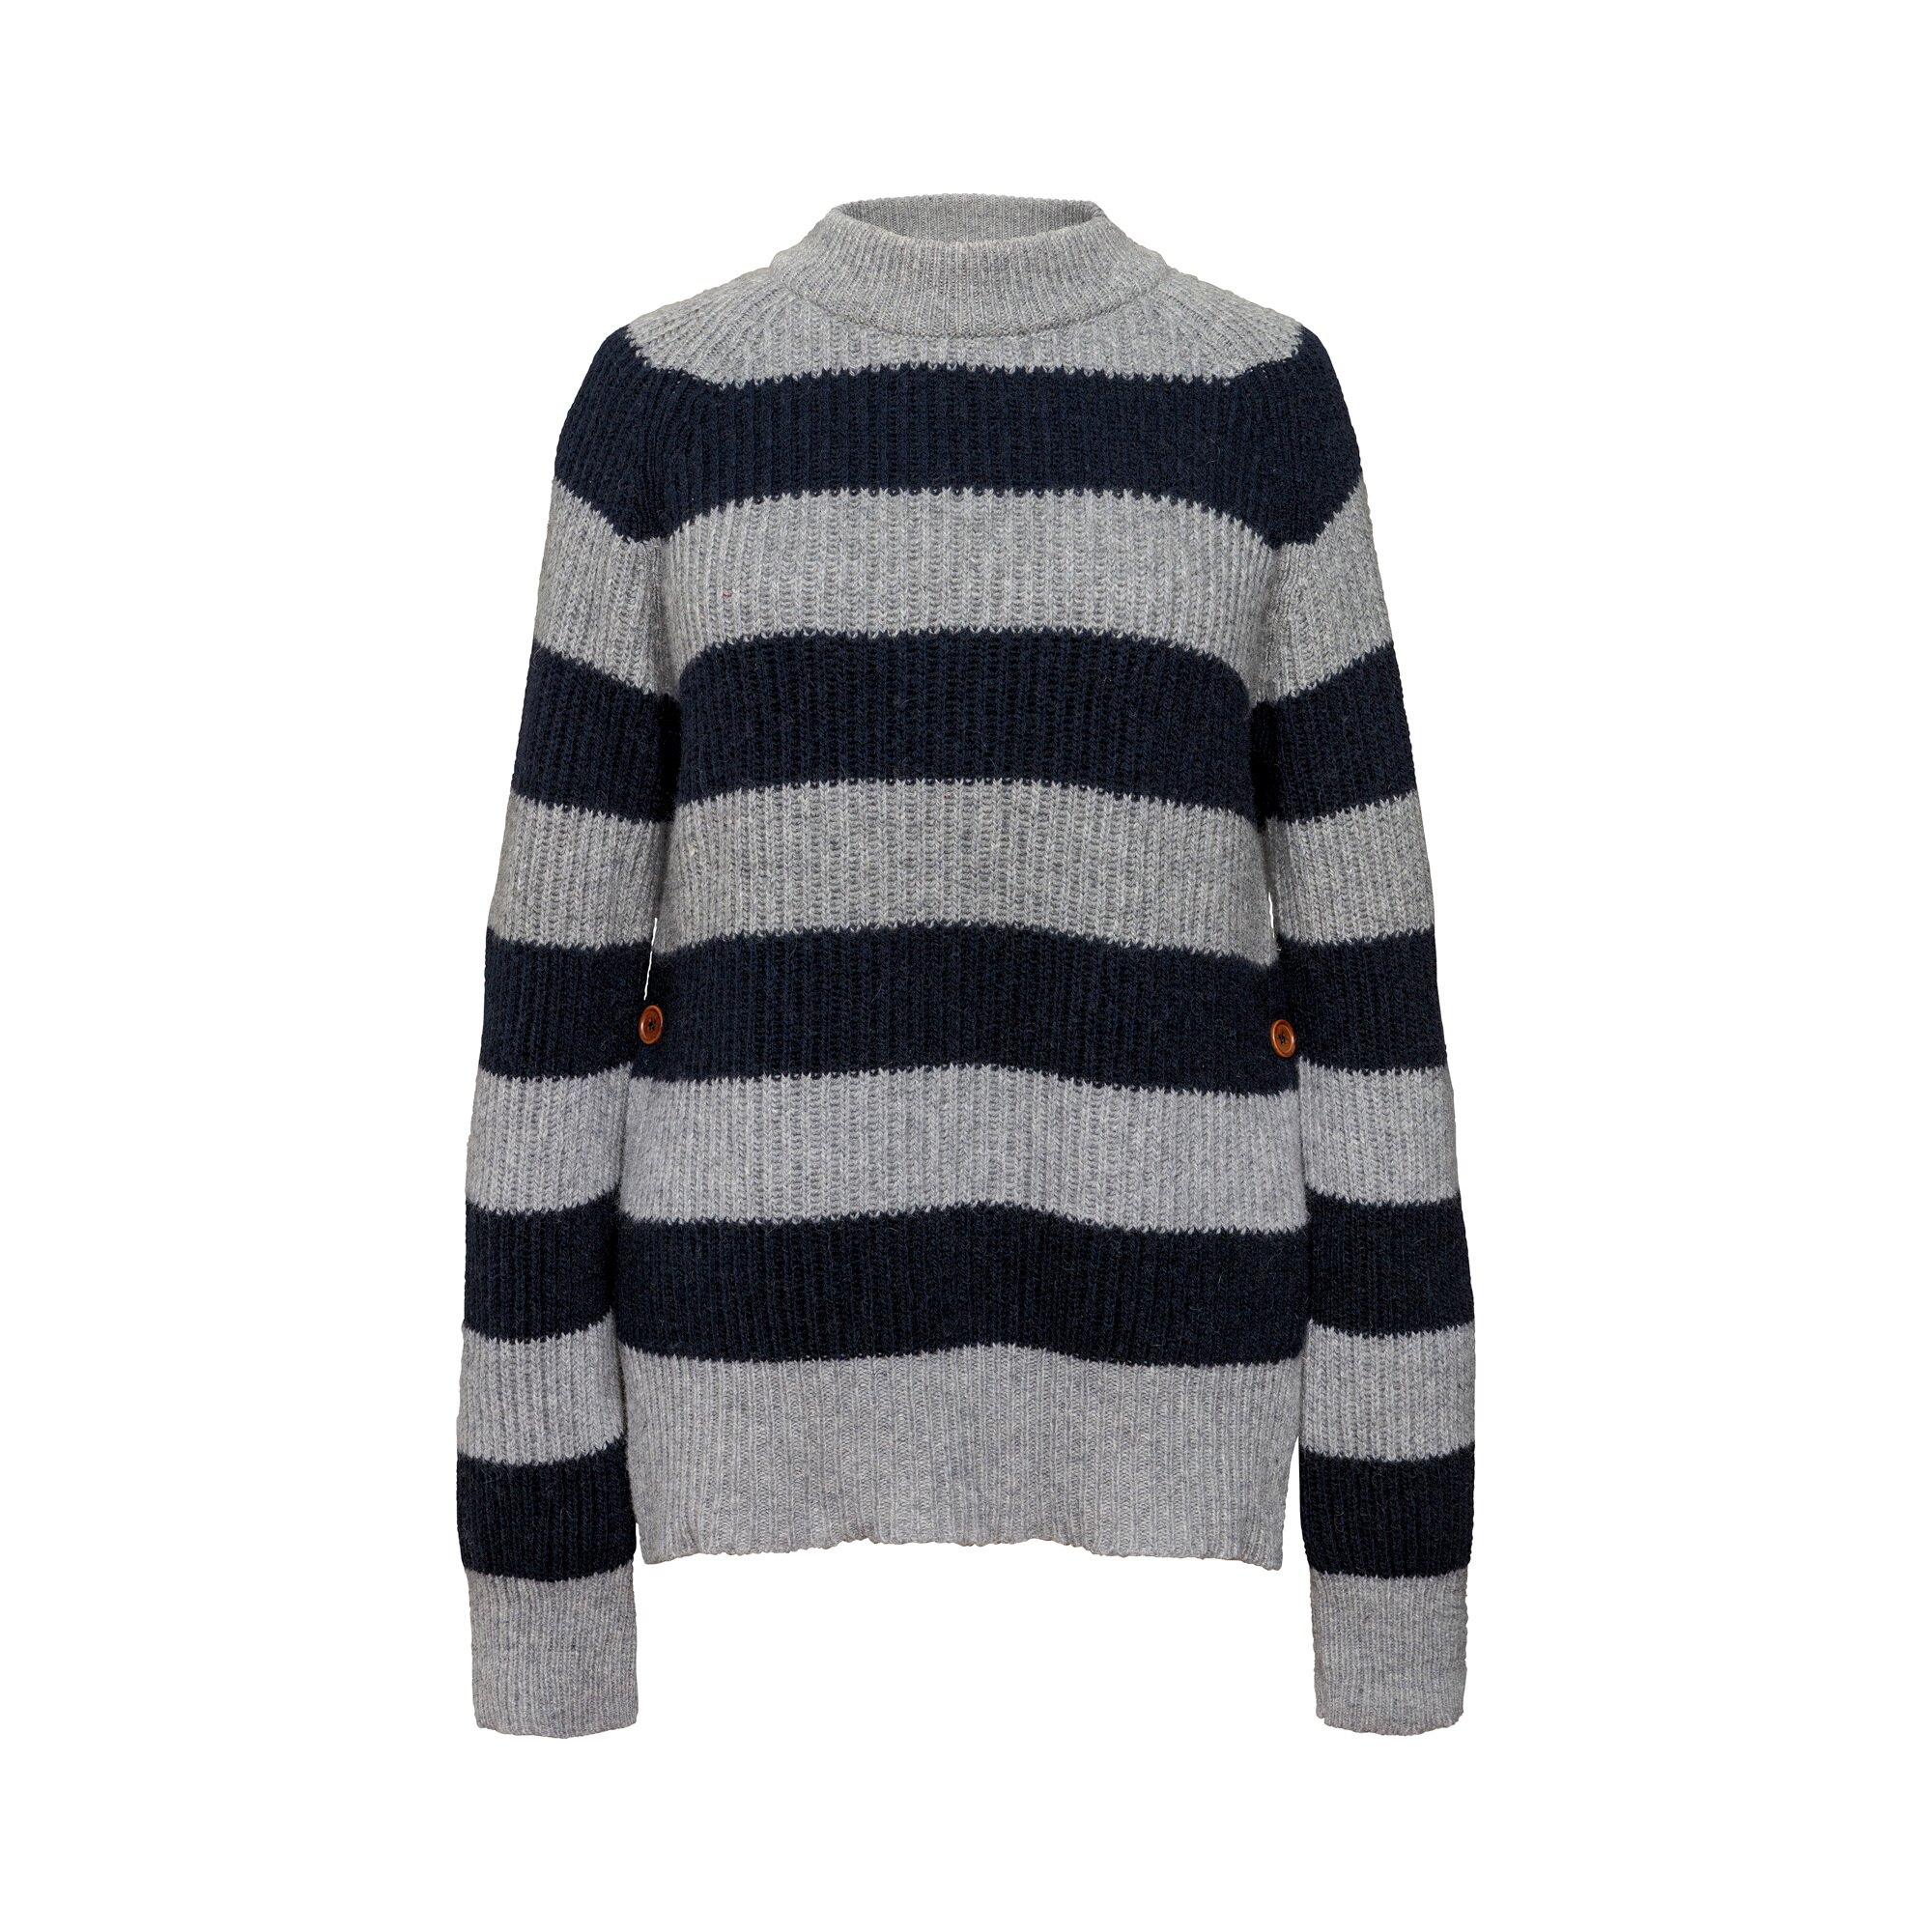 Boob® Umstands- und Still-Pullover Jaquelin recycelte Wolle